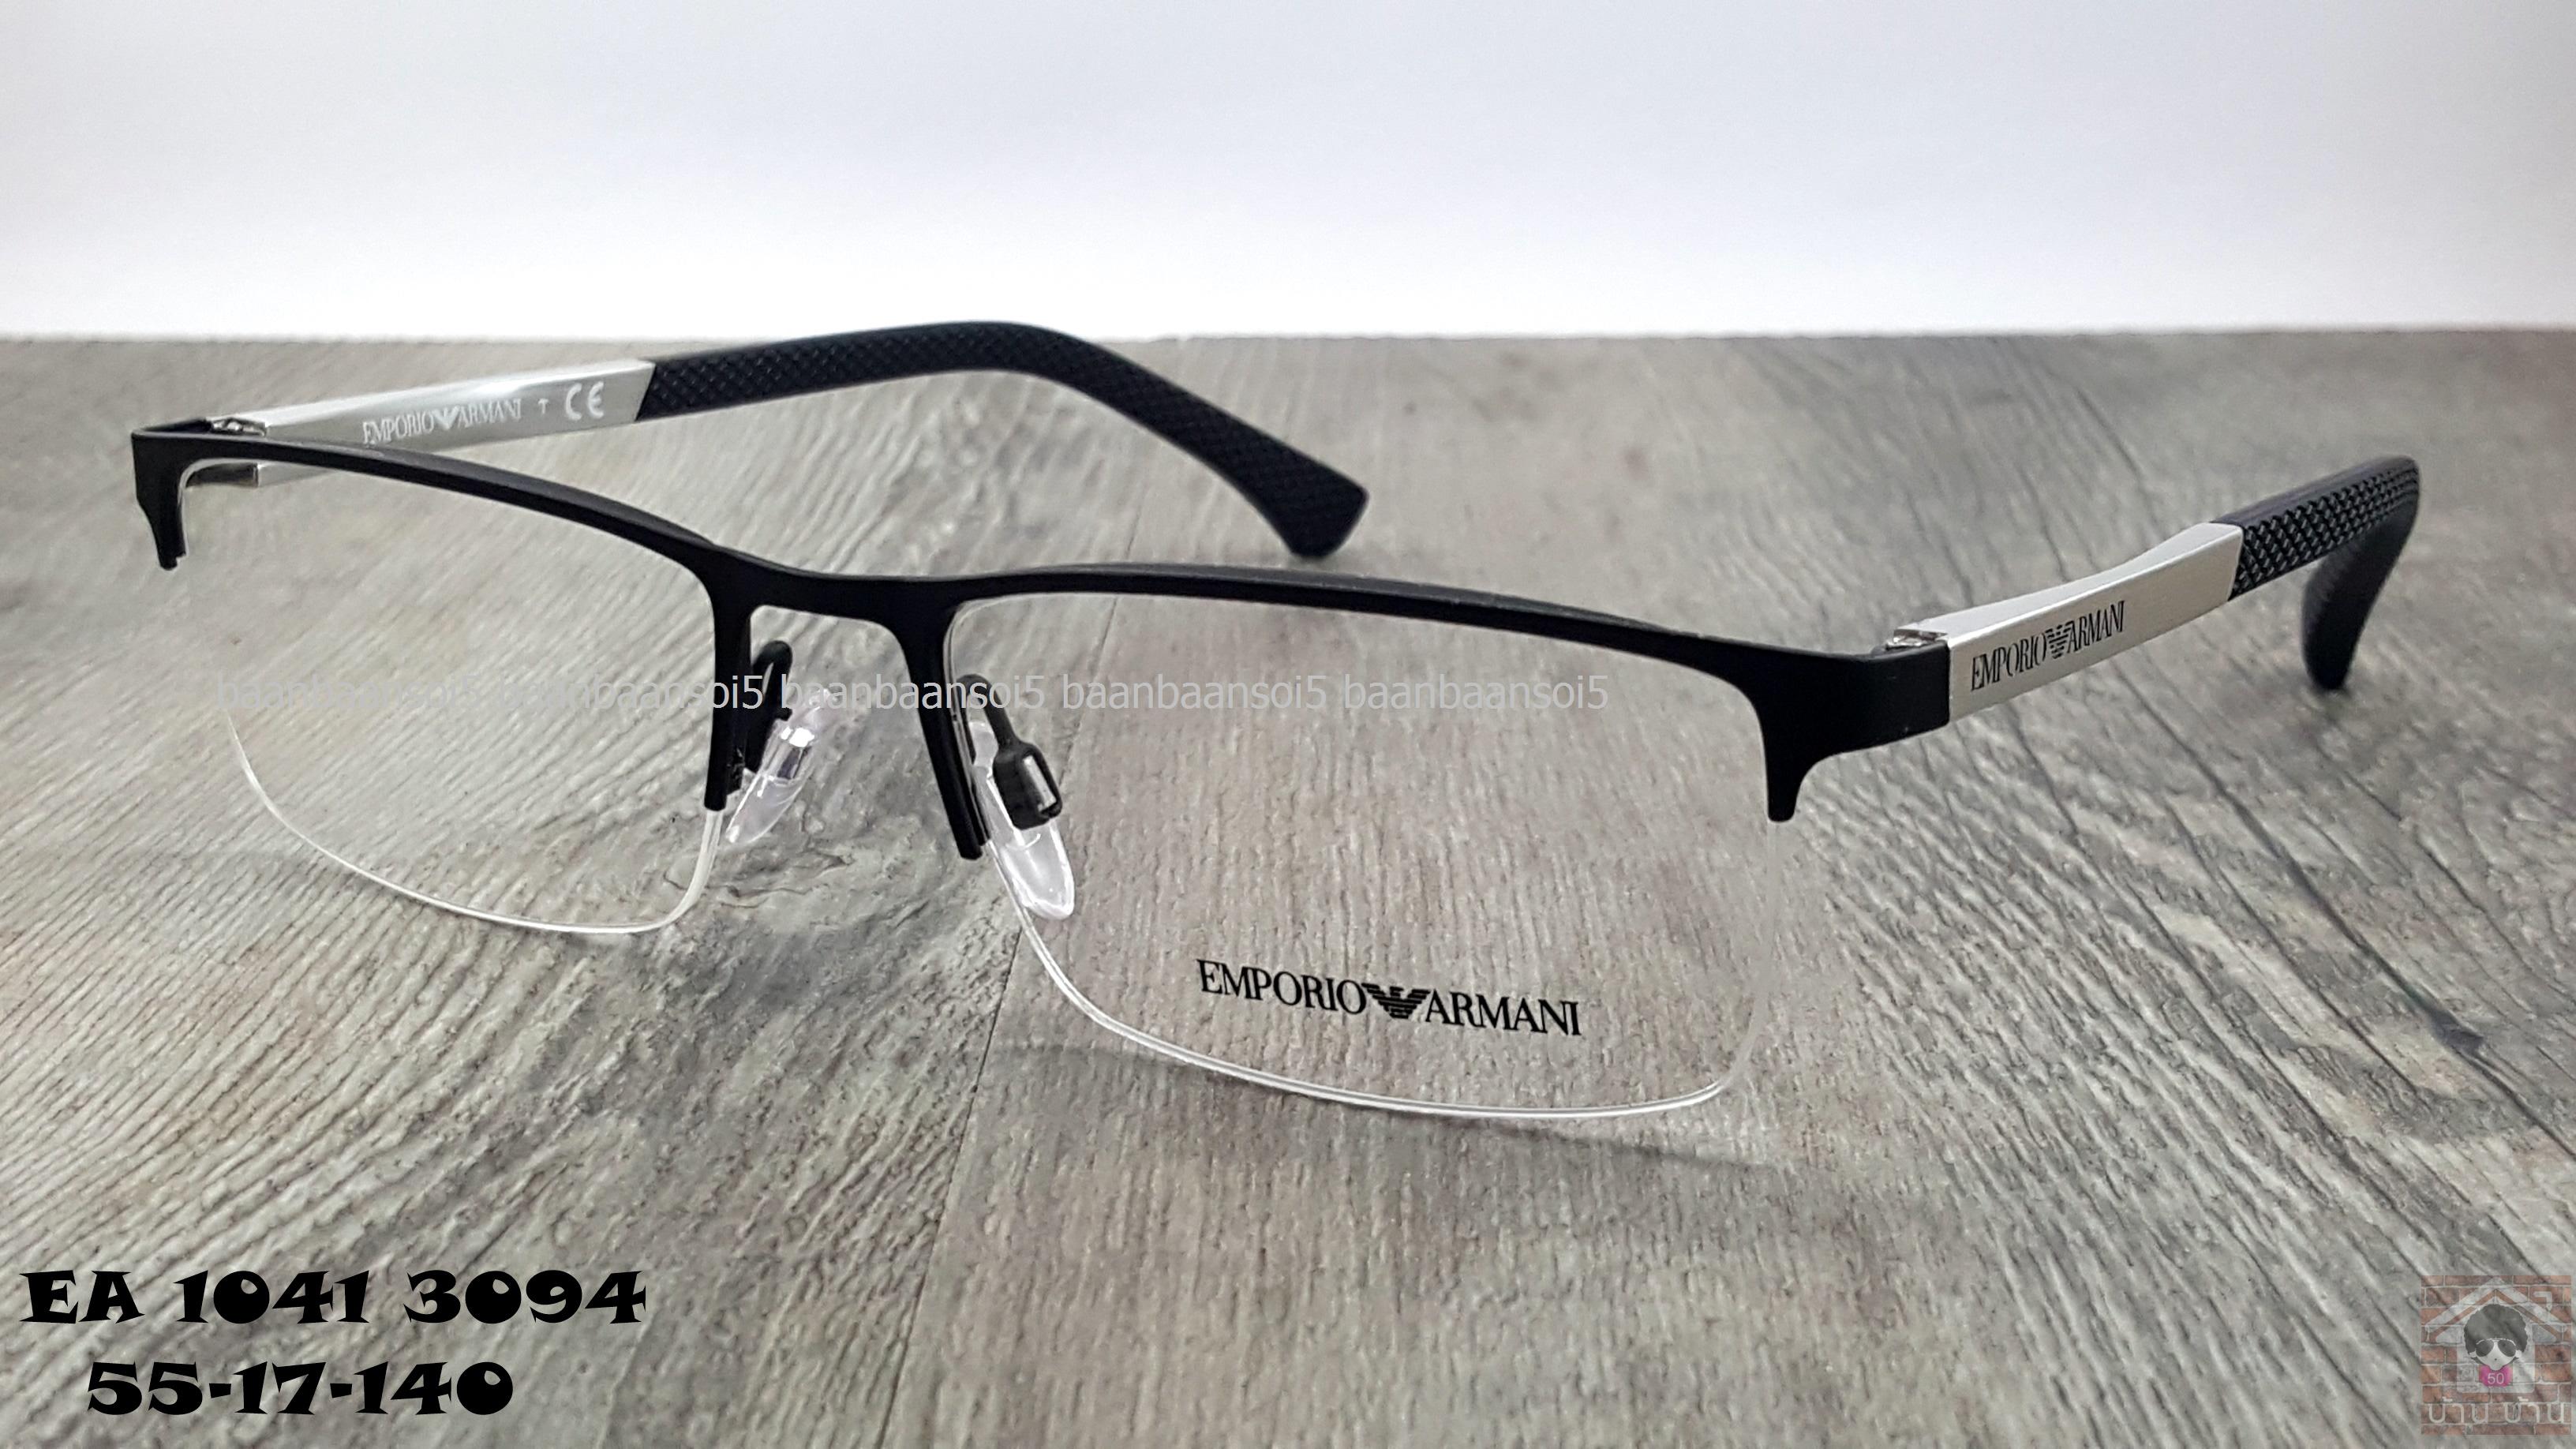 0c910153e Empoiro Armani EA 1041 3094 โปรโมชั่น กรอบแว่นตาพร้อมเลนส์ HOYA ราคา 5,300